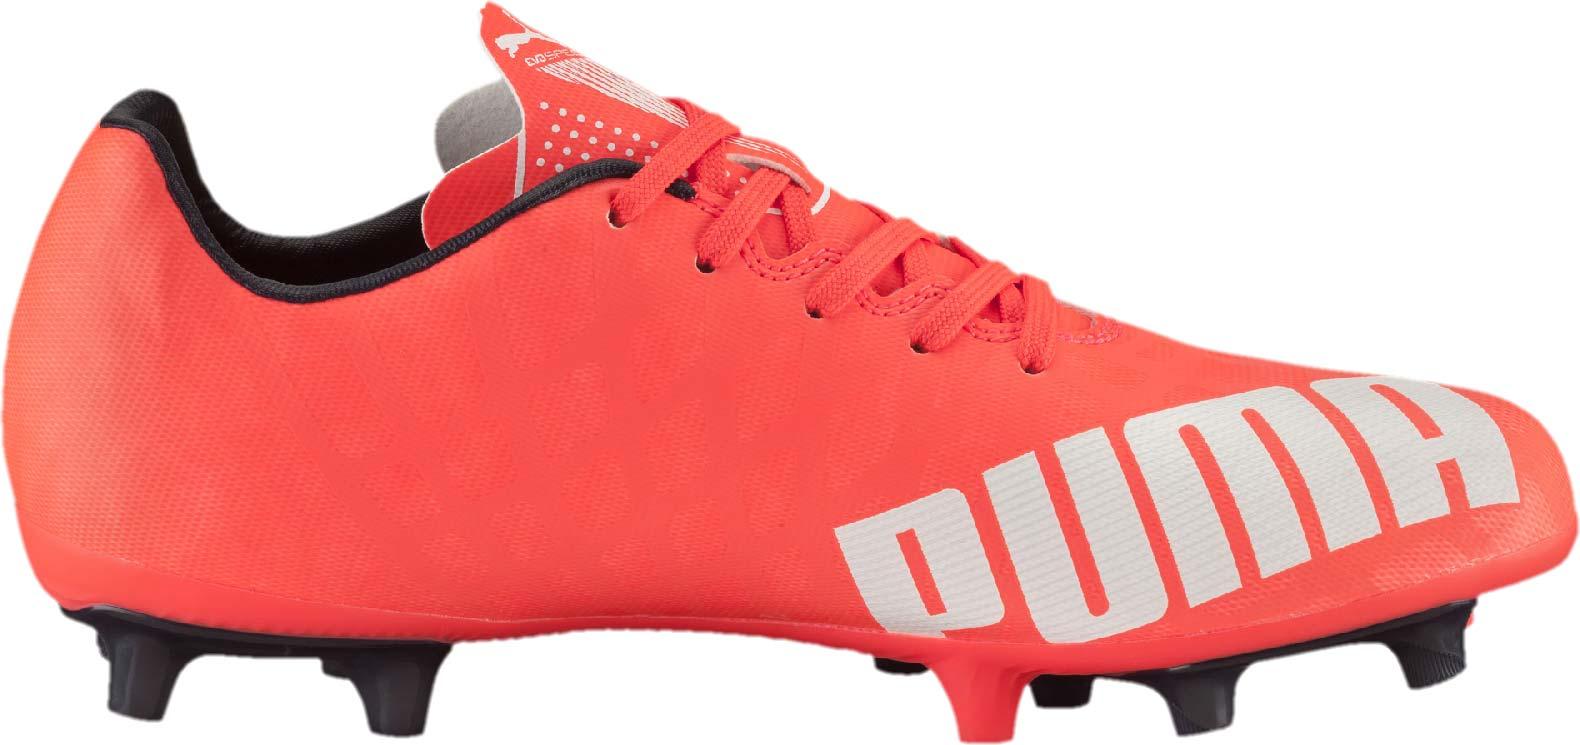 d2ab9f45c5 Children s Football Boots